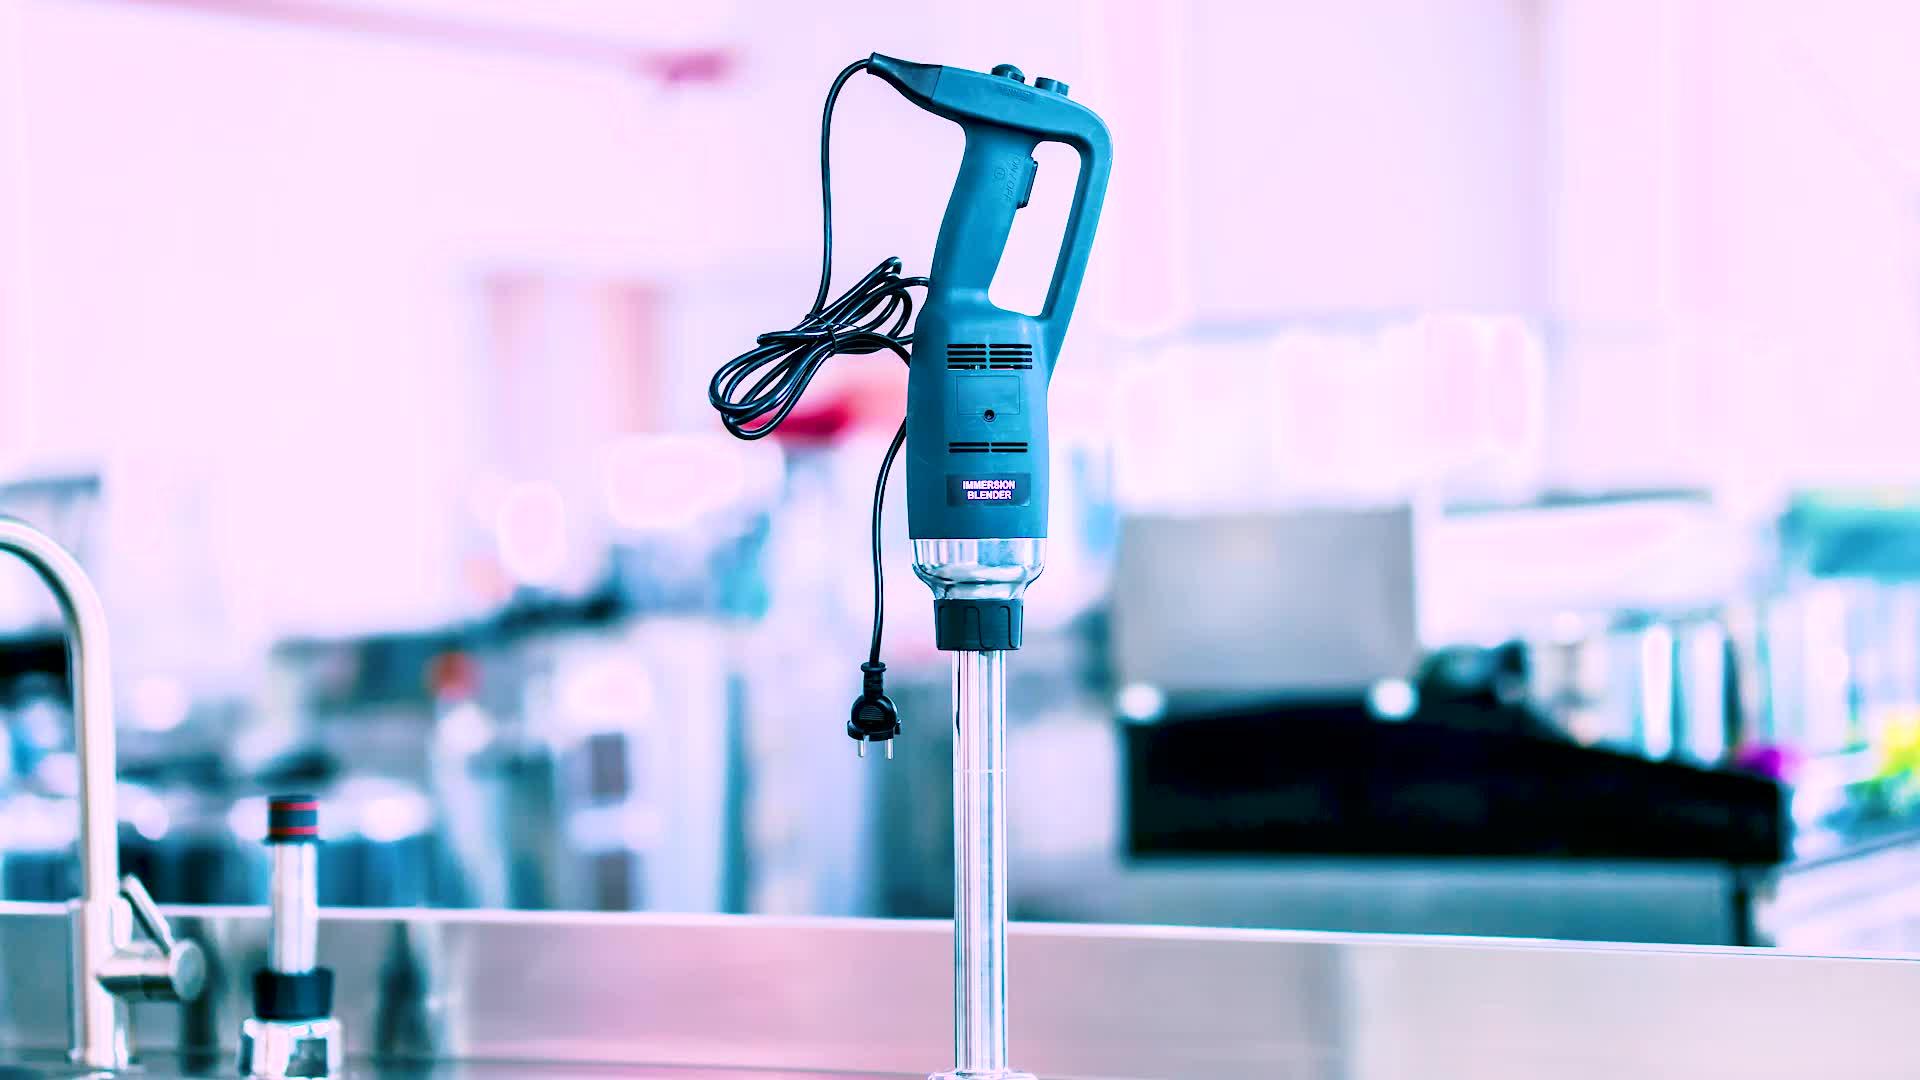 Multifunctionele Keuken Woonkamer Rvs Blades Elektrische Motor Industriële Hand Blender